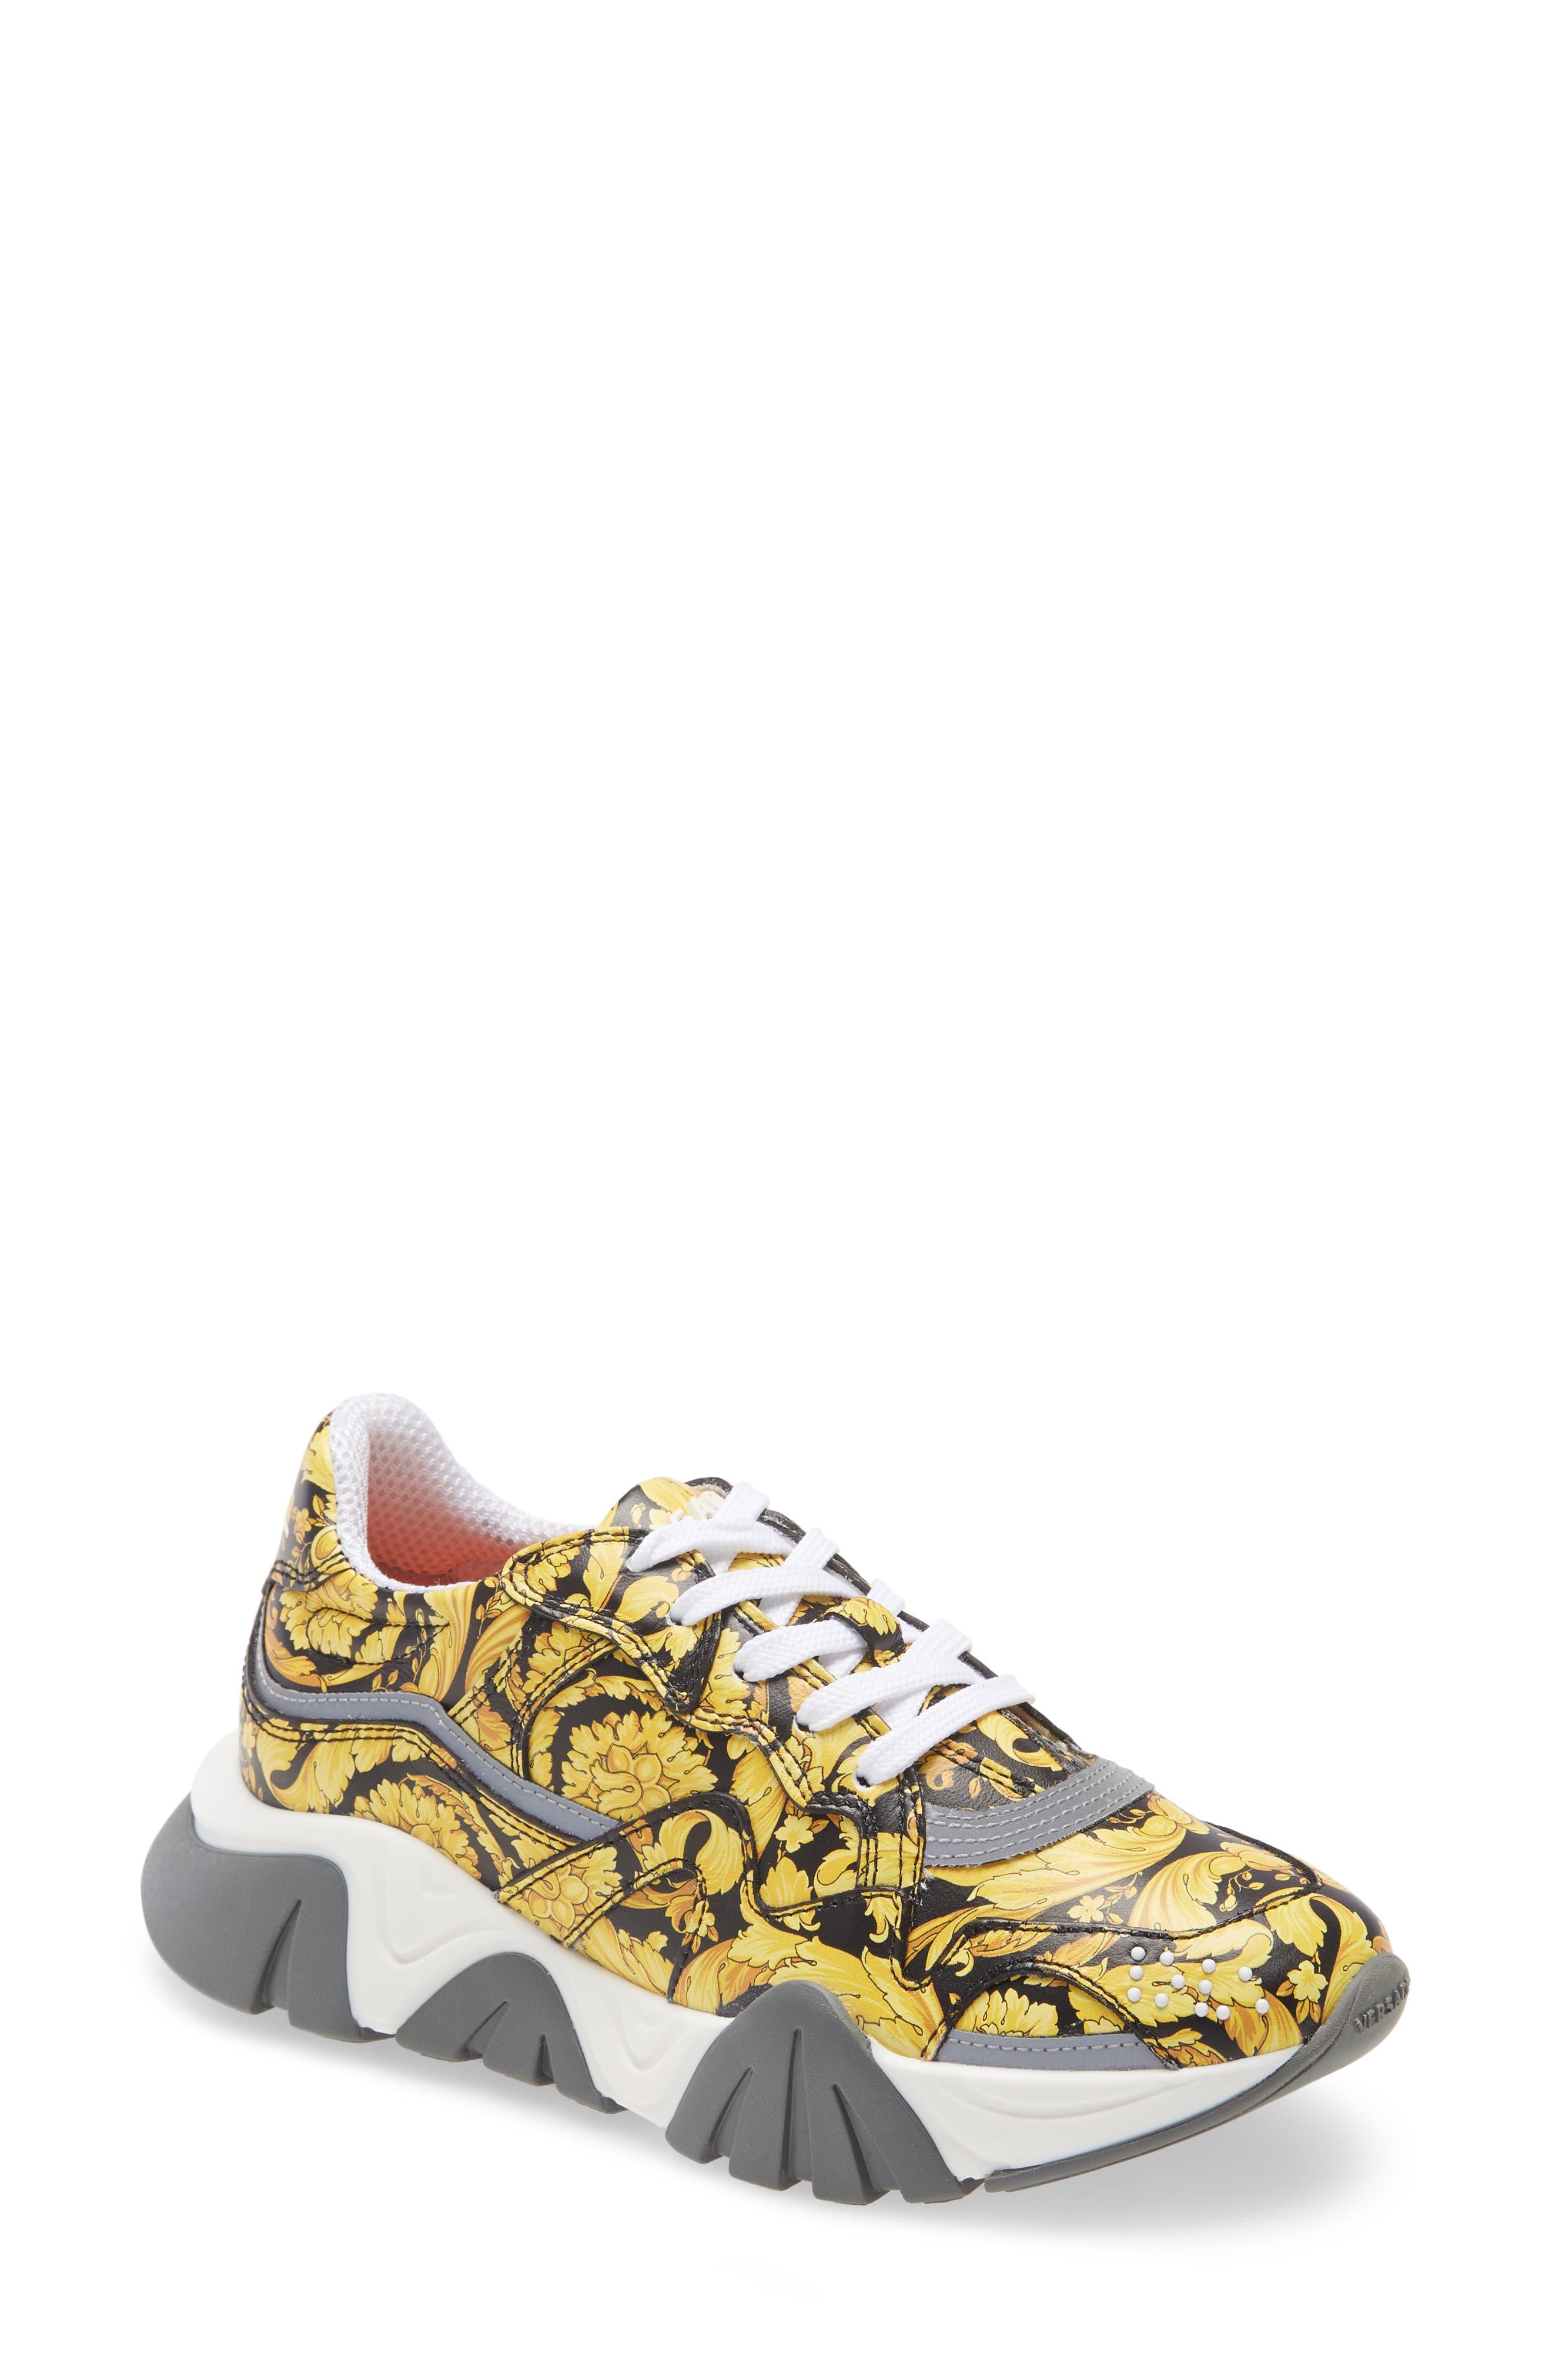 Girls' Yellow Sneakers, Tennis Shoes